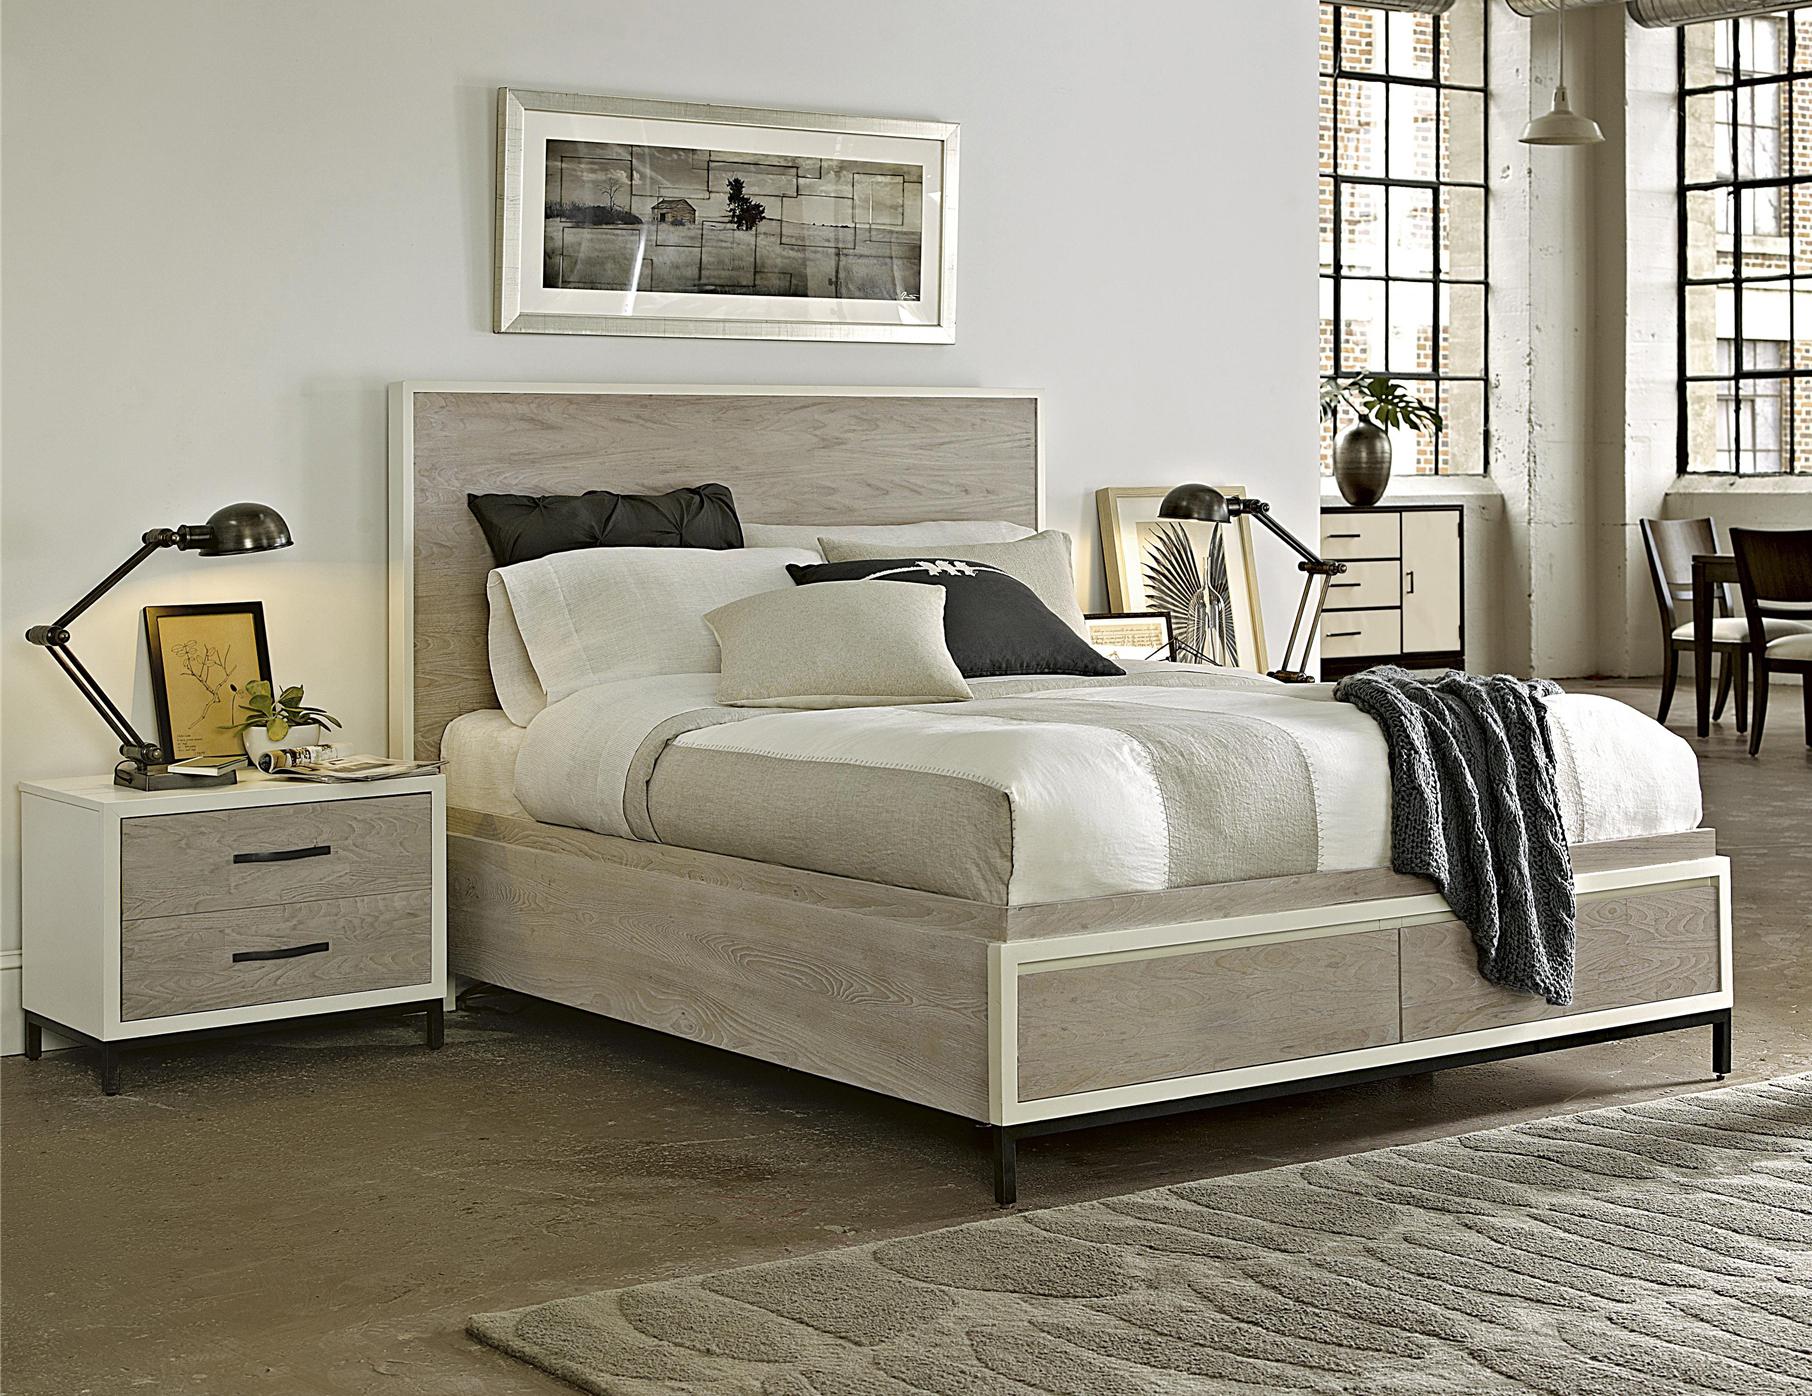 Five Modern Bedroom Furniture Ideas